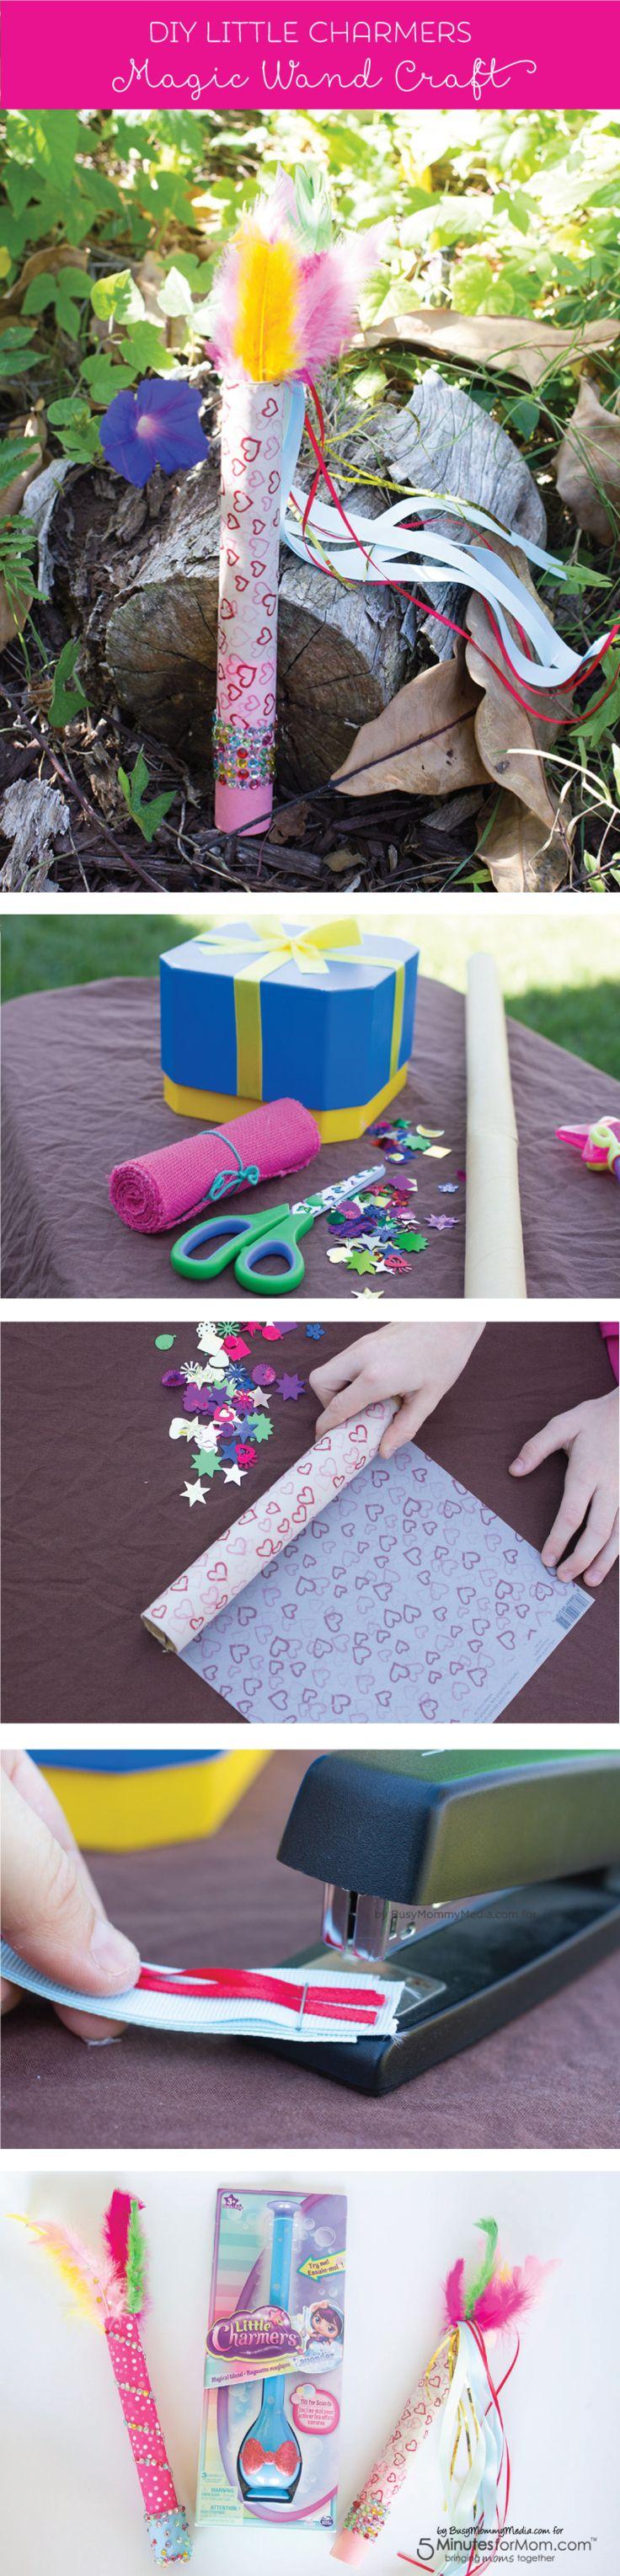 Little Charmers Magic Wand Craft